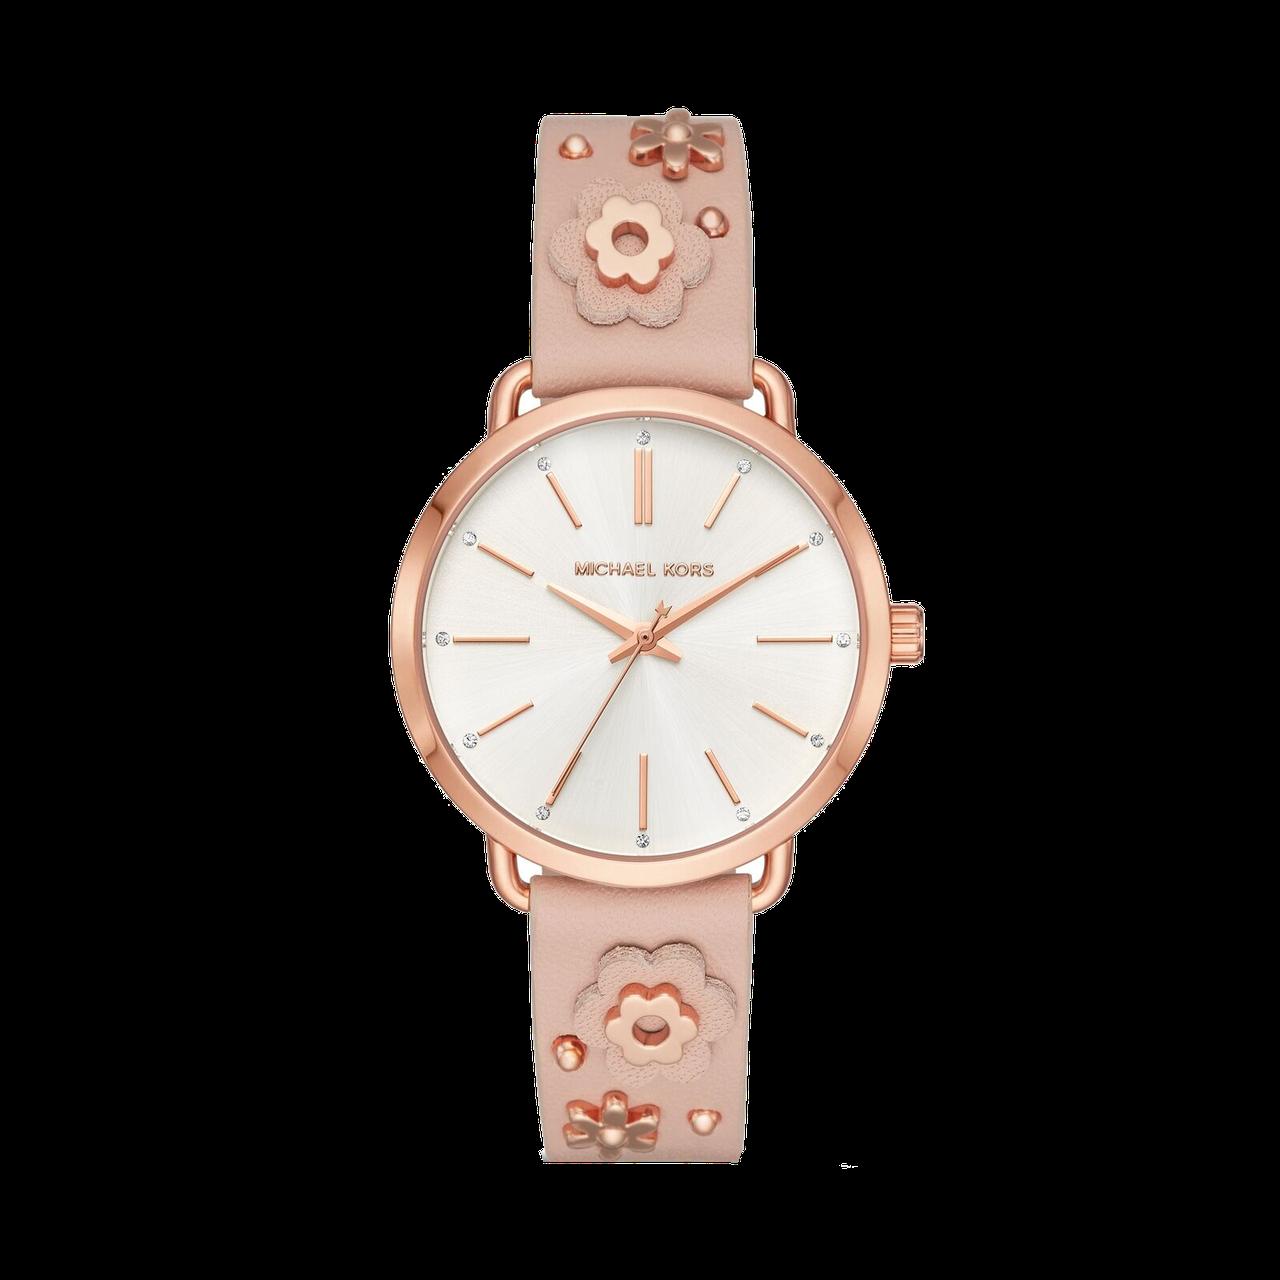 Женские часы Michael Kors MK2738